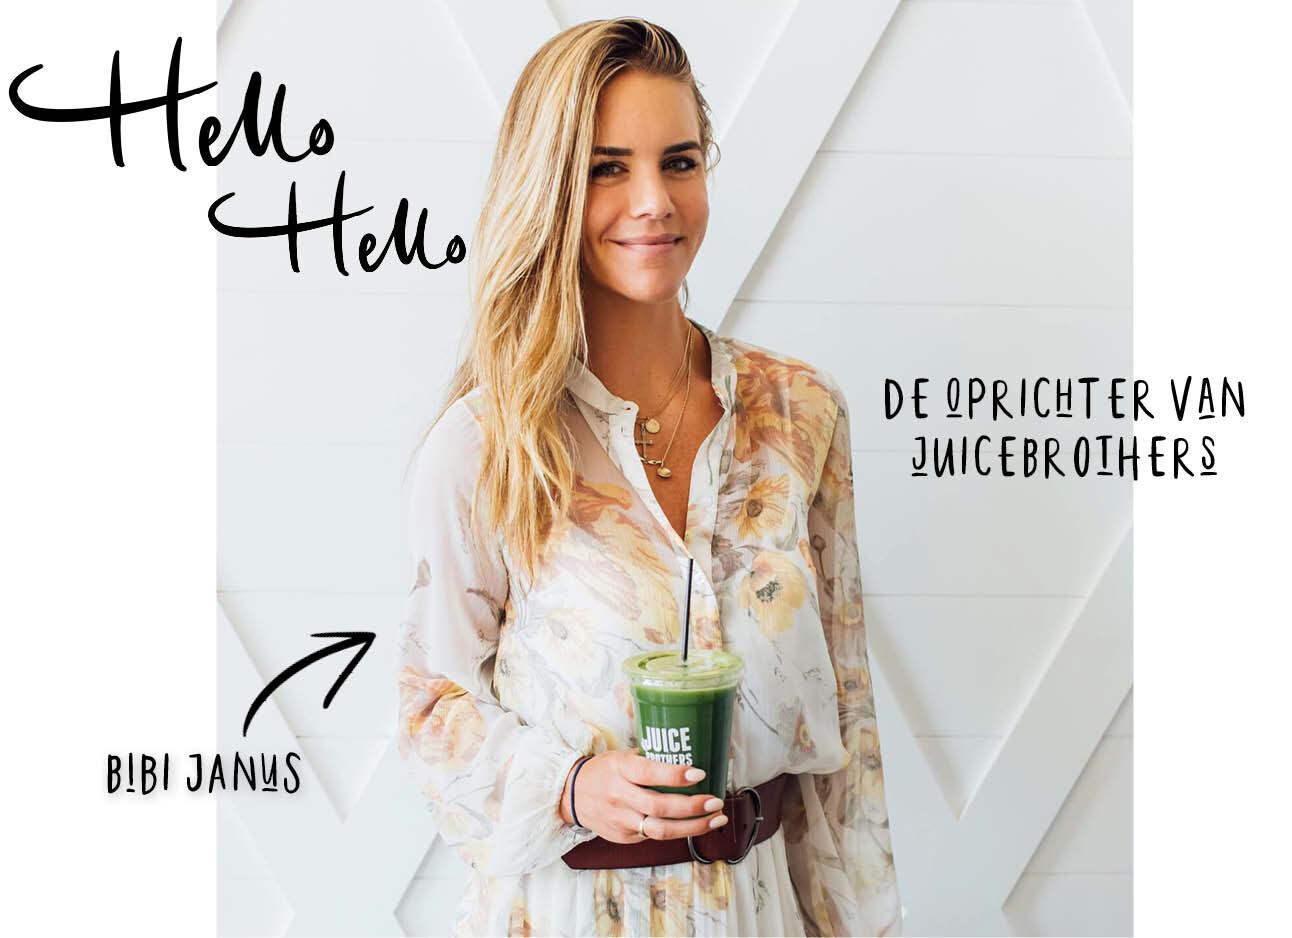 Woman behind the brand Bibi Janus